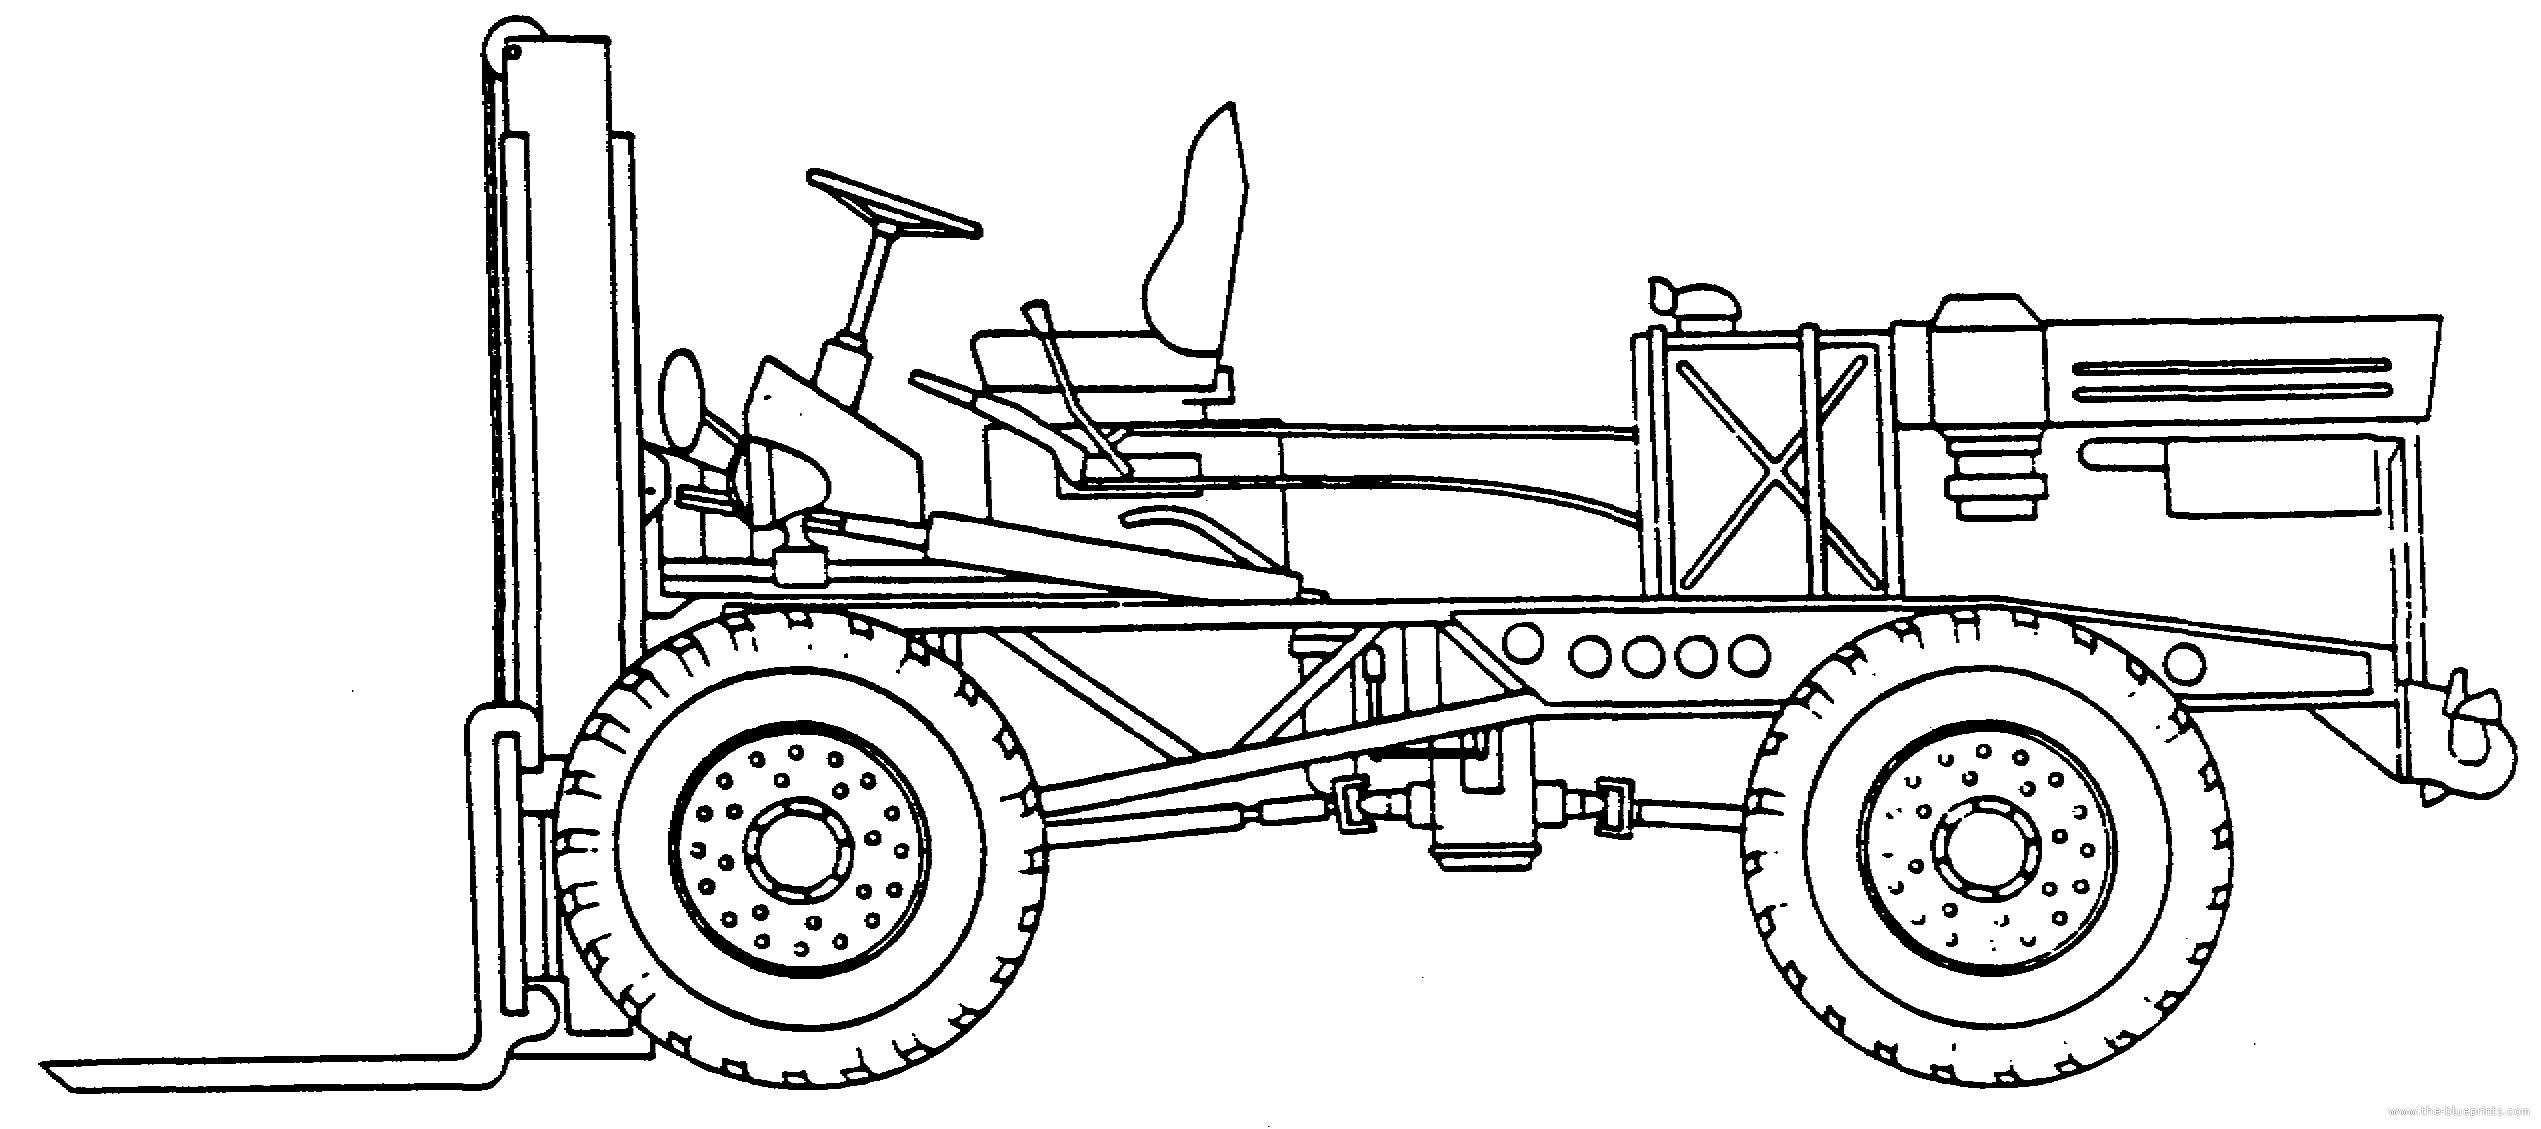 Ram Launcher Dimensions